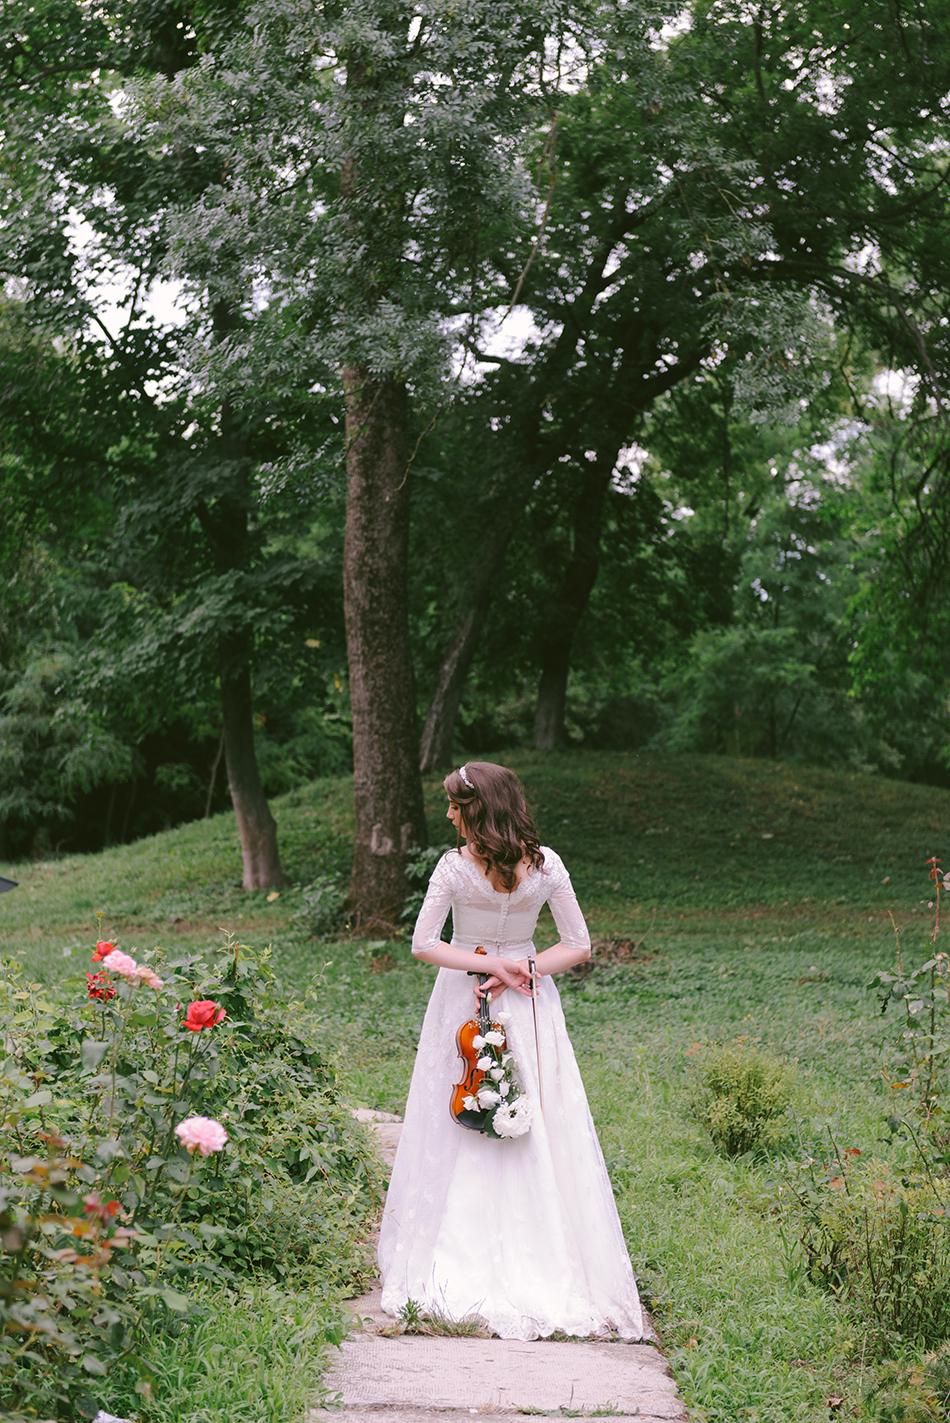 AD Passion Photography | sami-ela-lela-nunta-domeniu-lupas-arad_0040 | Adelin, Dida, fotograf profesionist, fotograf de nunta, fotografie de nunta, fotograf Timisoara, fotograf Craiova, fotograf Bucuresti, fotograf Arad, nunta Timisoara, nunta Arad, nunta Bucuresti, nunta Craiova